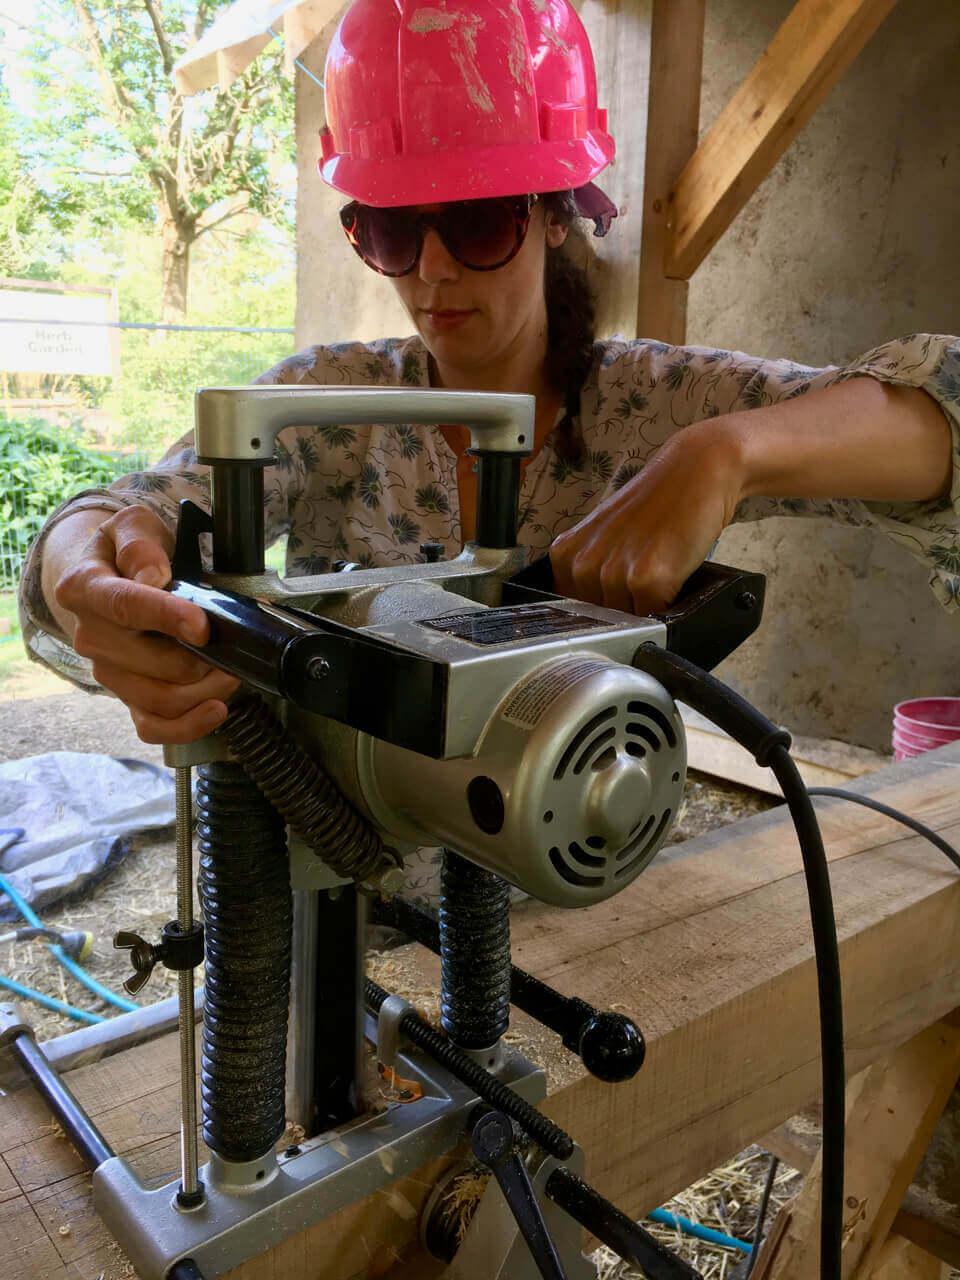 women using tool to timberframe